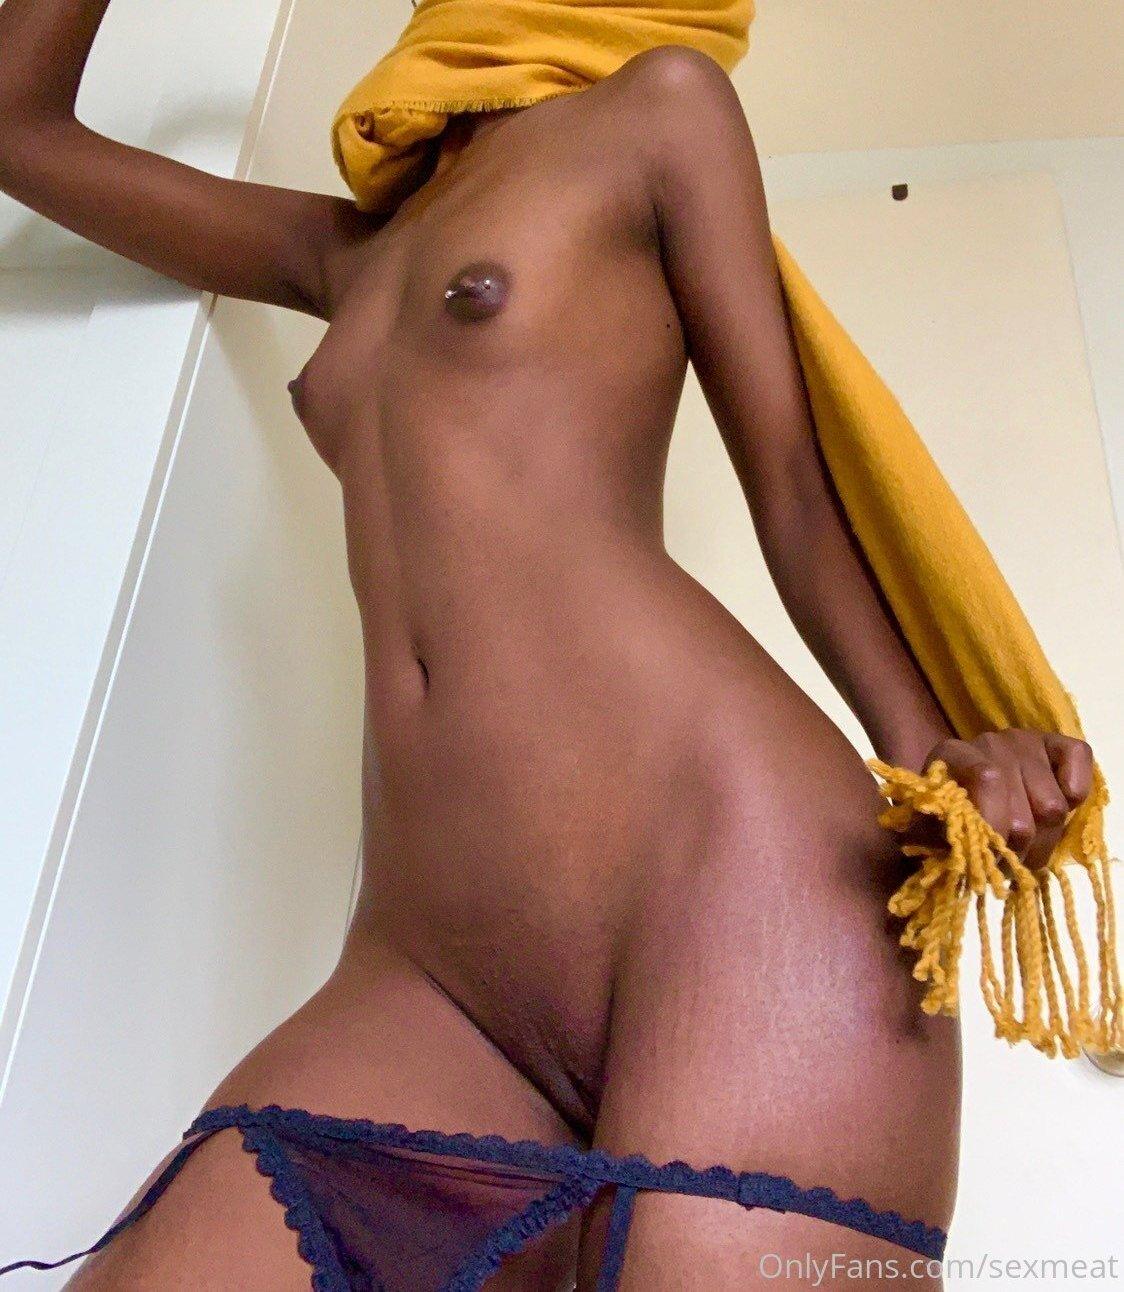 Sexmeat Sluttysexmeat Onlyfans Nude Leaks (39 Photos) Nudostar0033